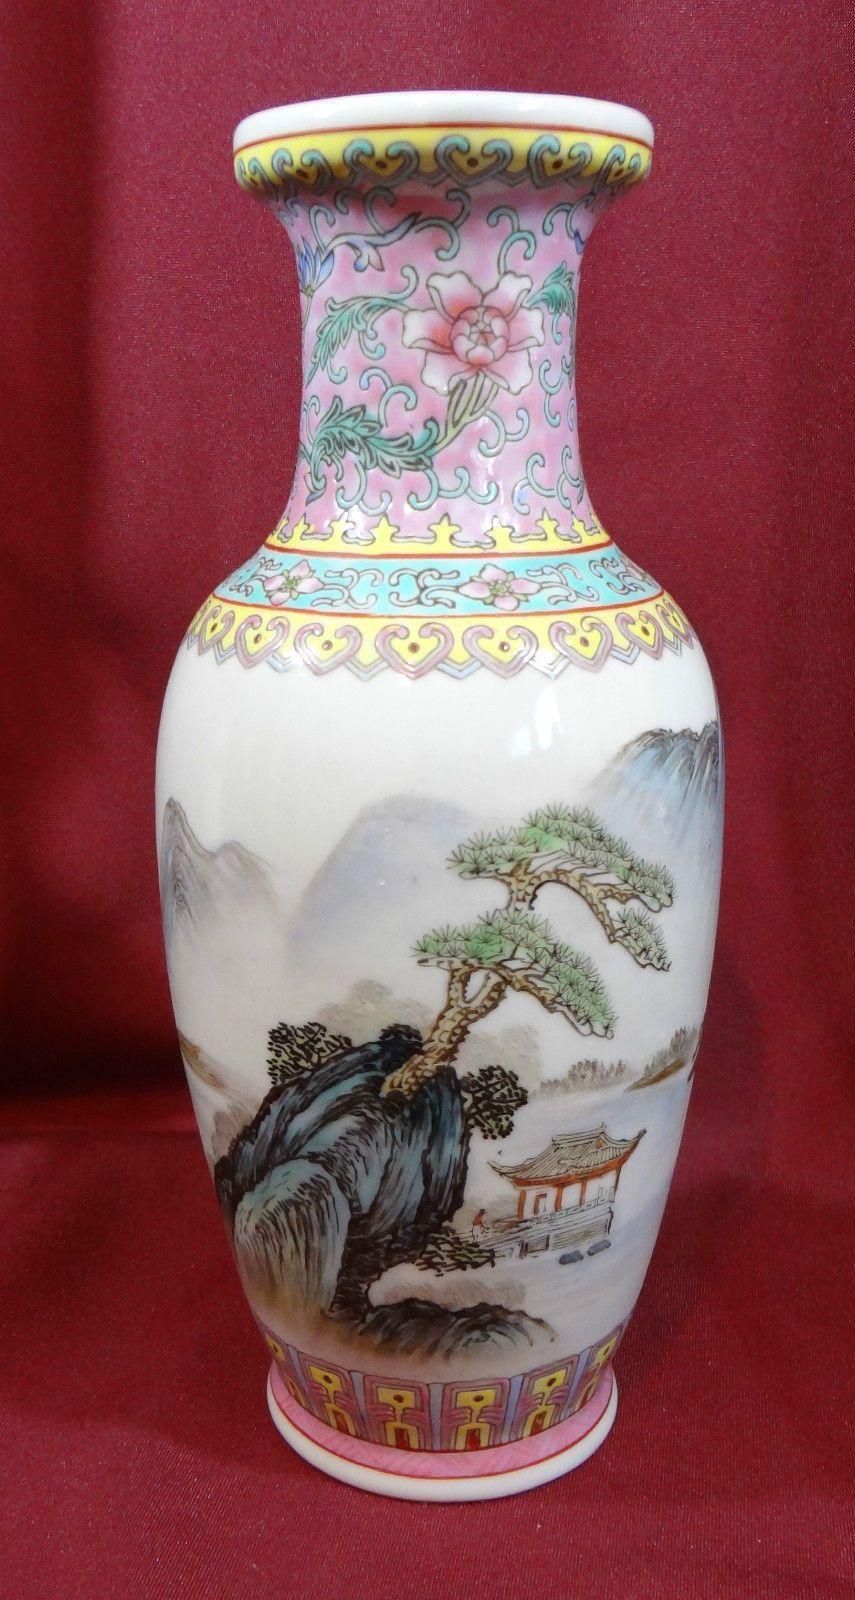 Flower Vase blue and white Pastel bottle vintage vase Home Decor Ceramic ornament vase Pottery Vase Ceramic Vase vase jar